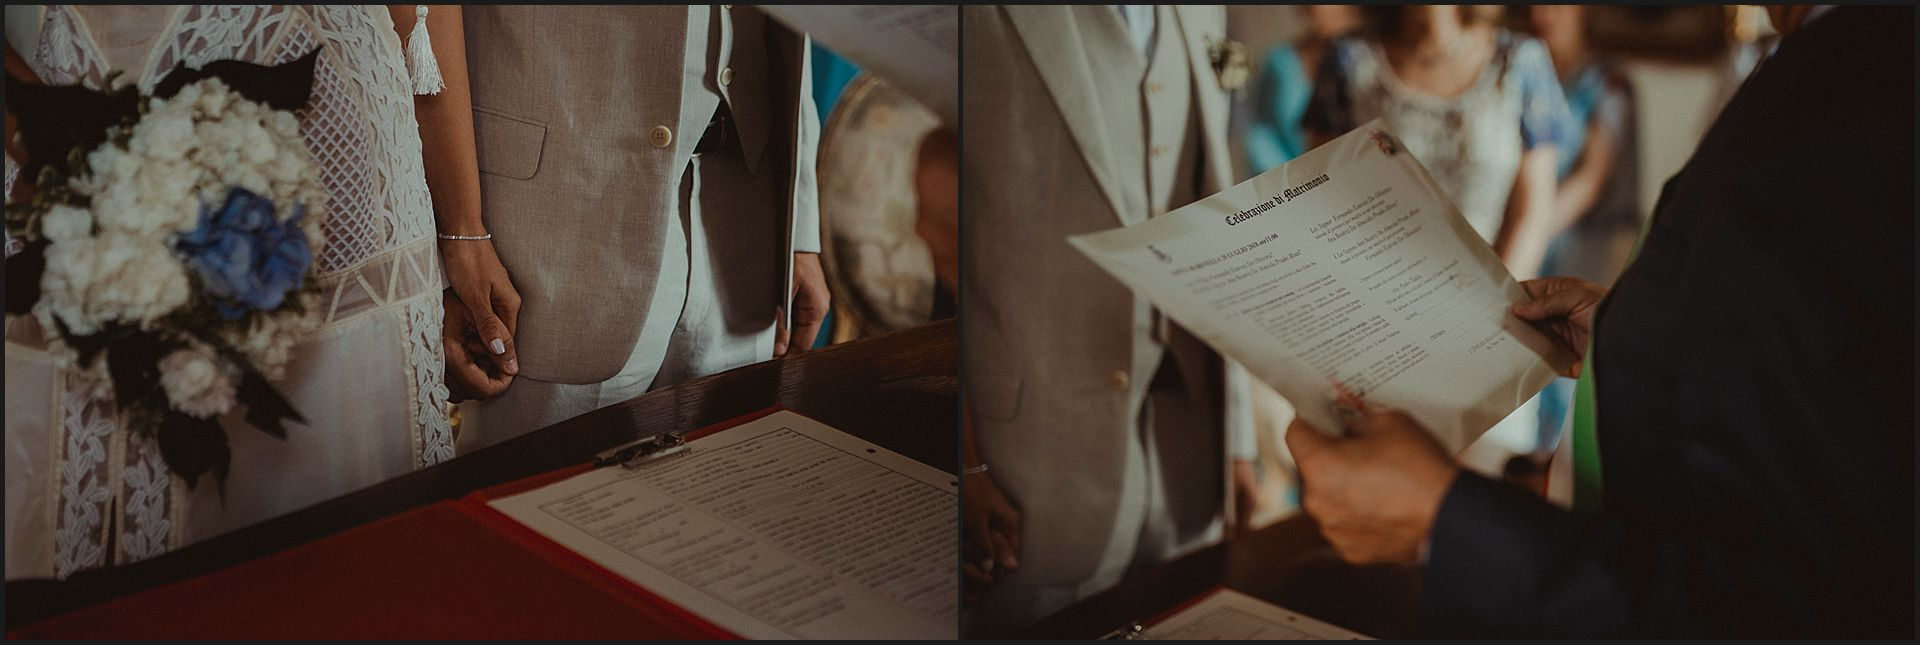 wedding details, ceremony, destination wedding, civil wedding, civitavecchia, santa marinella, rome